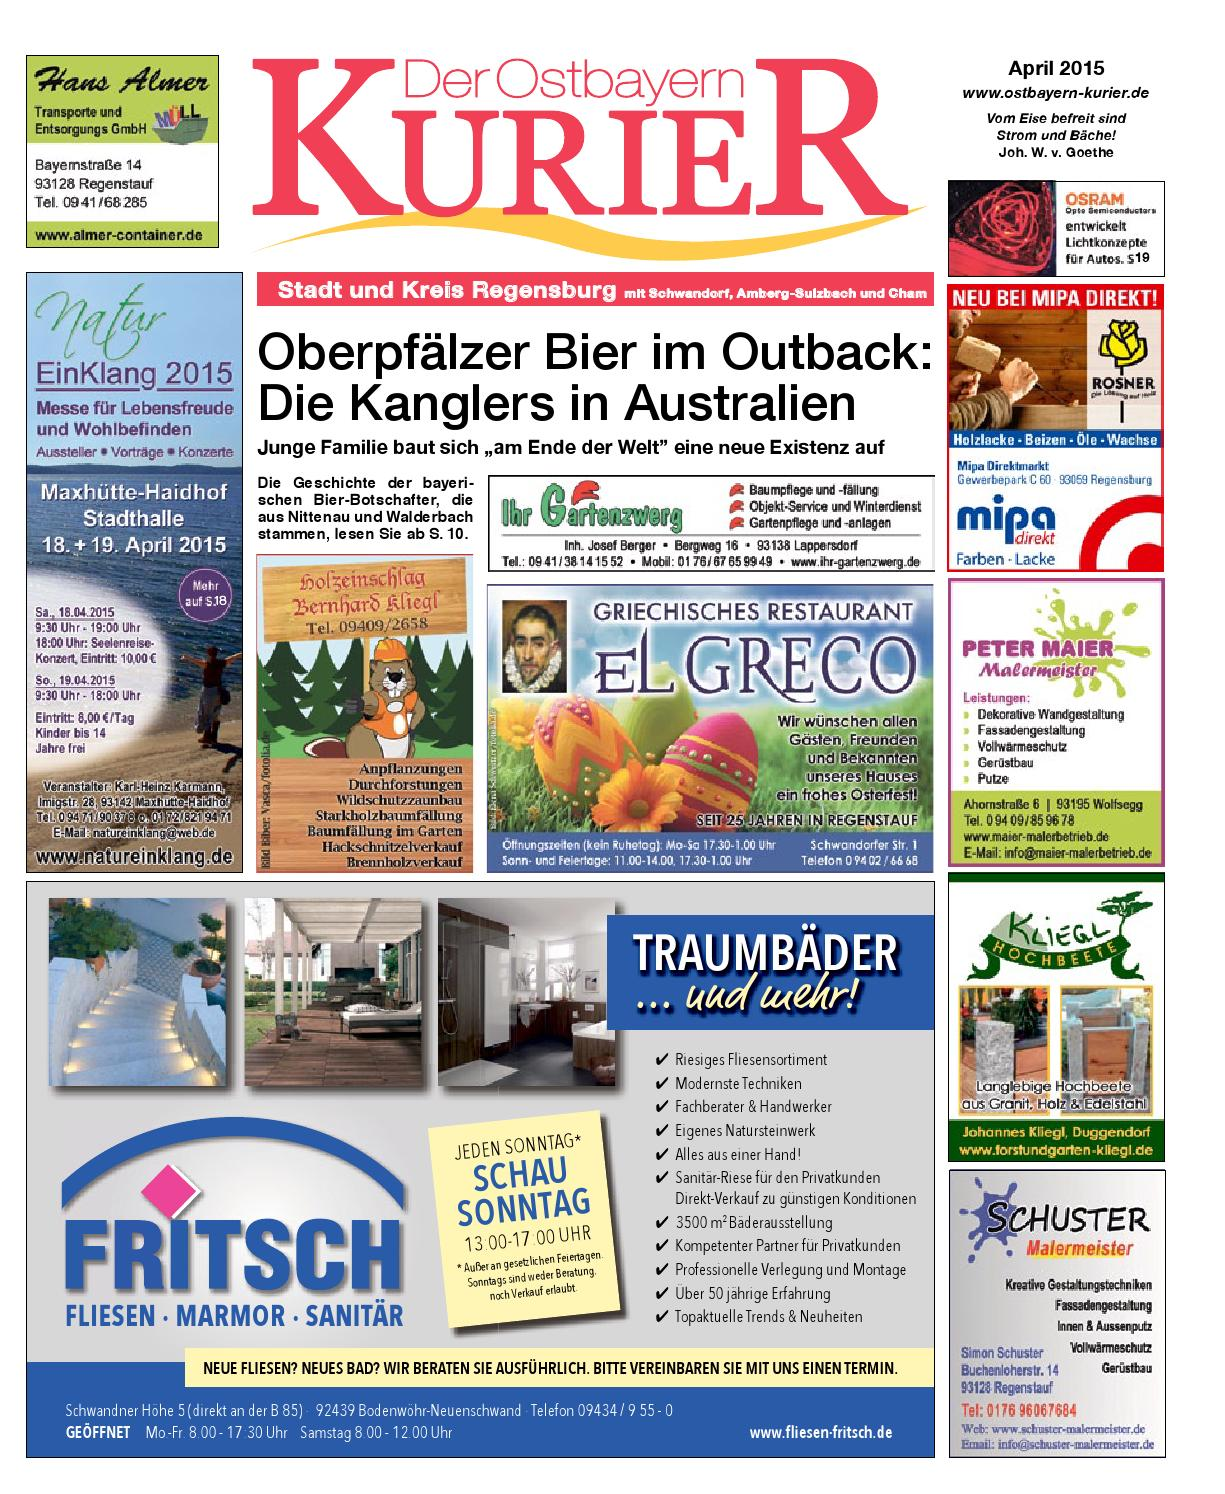 Sued Ostbayern Kurier April 2015 By Medienverlag Hubert Süß   Issuu